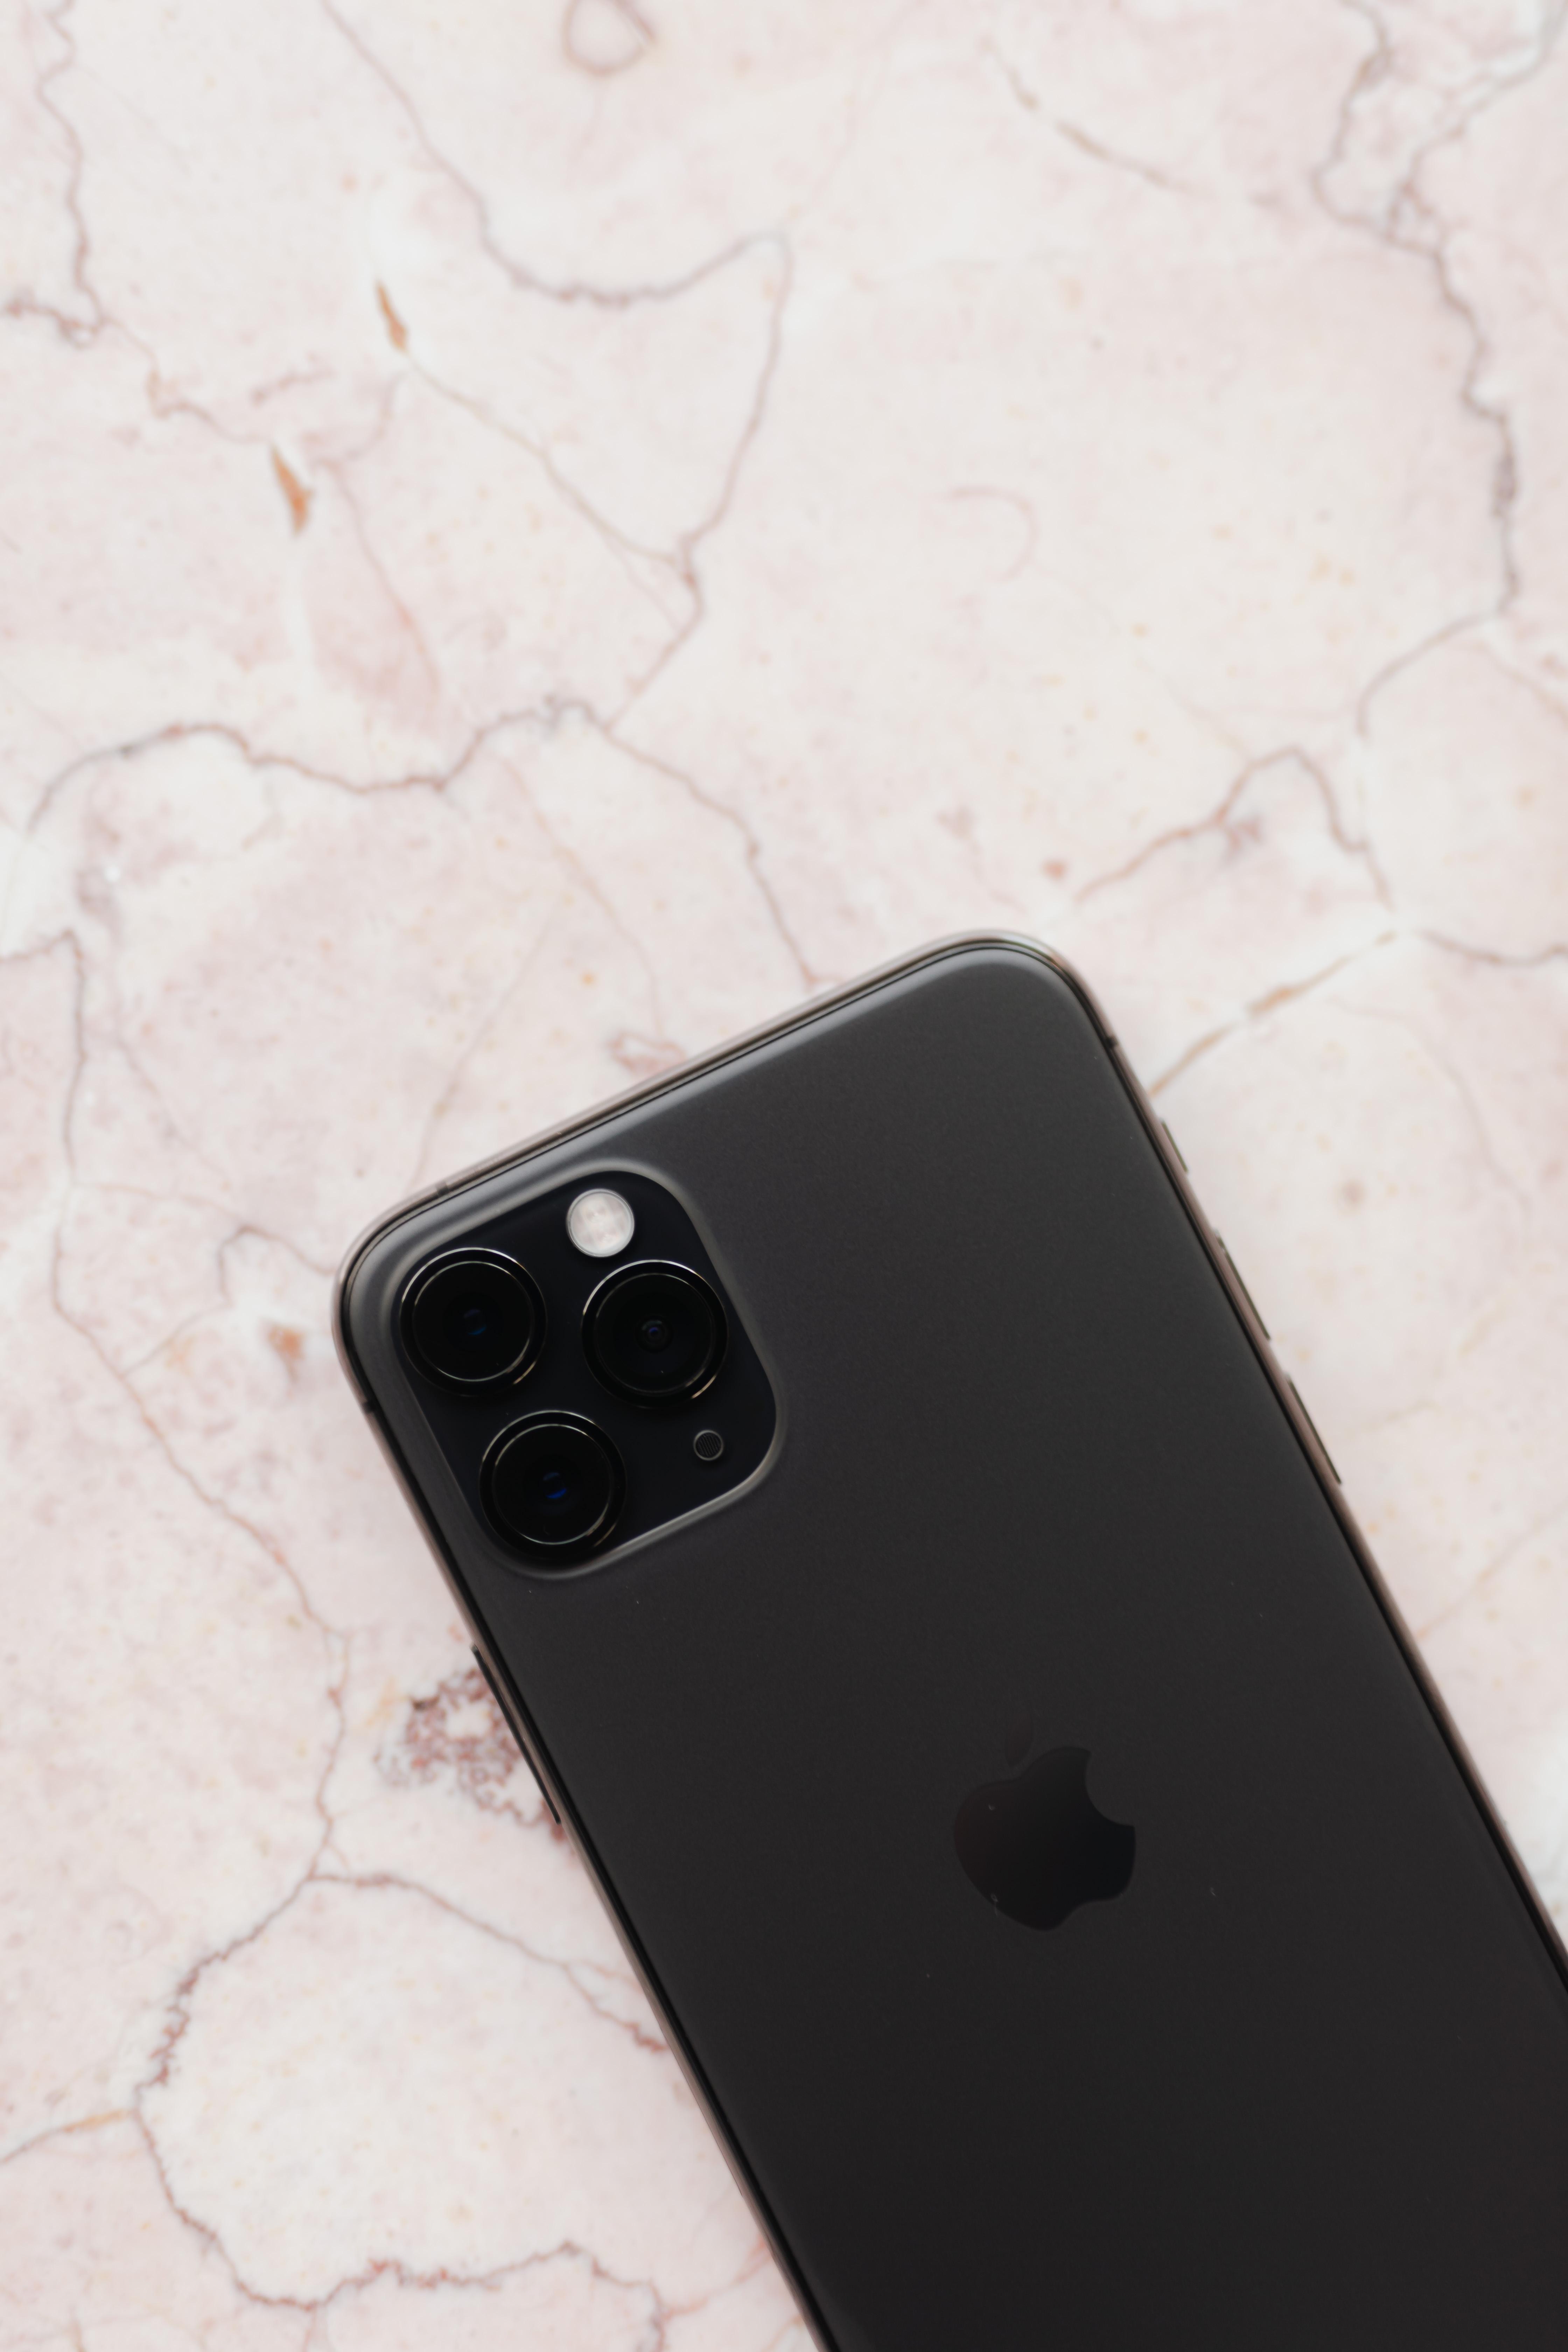 Apple iPhone 11 Pro on marble